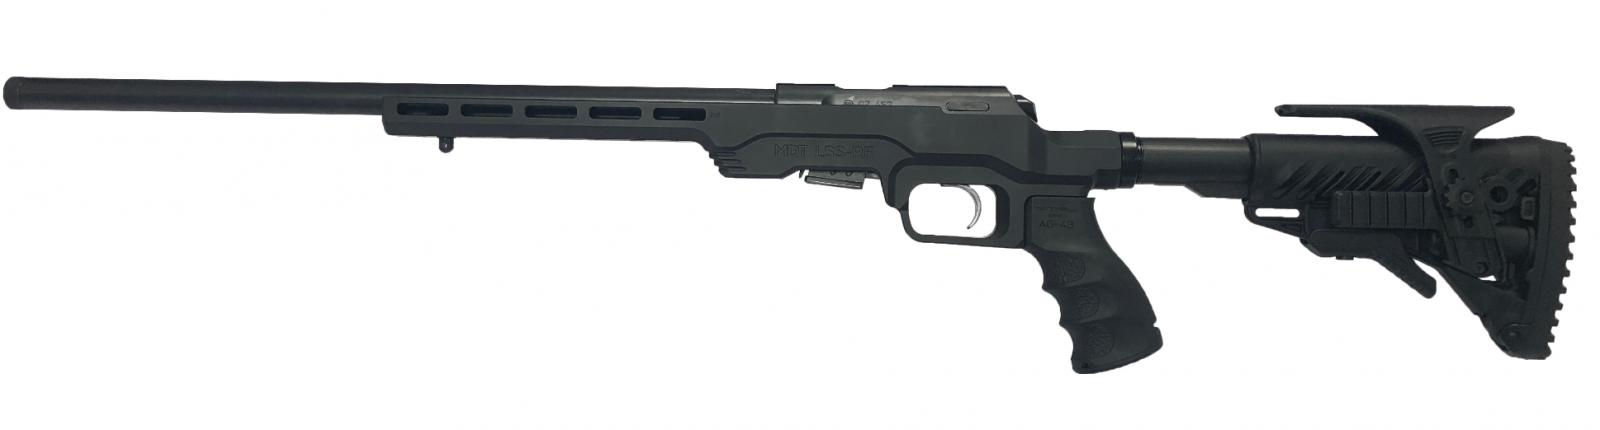 Carabine CZ 457 MDT